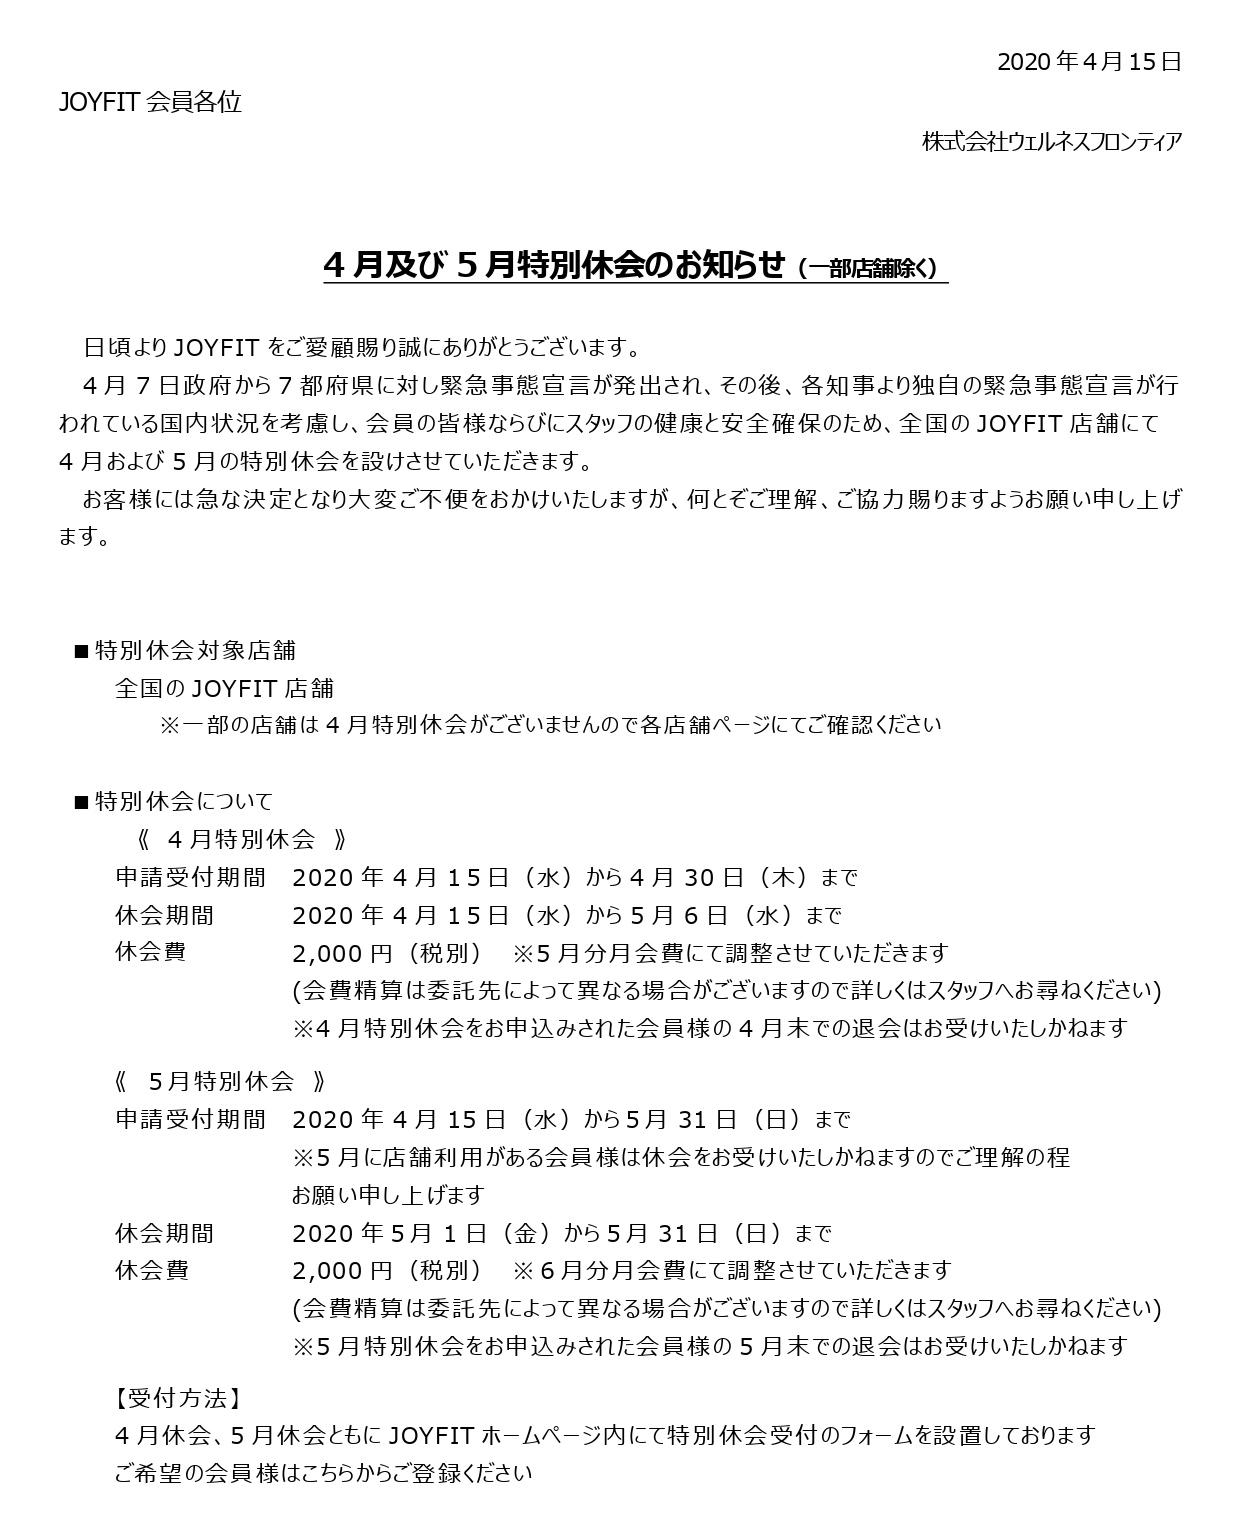 【JOYFIT】4月及び5月特別休会のお知らせ